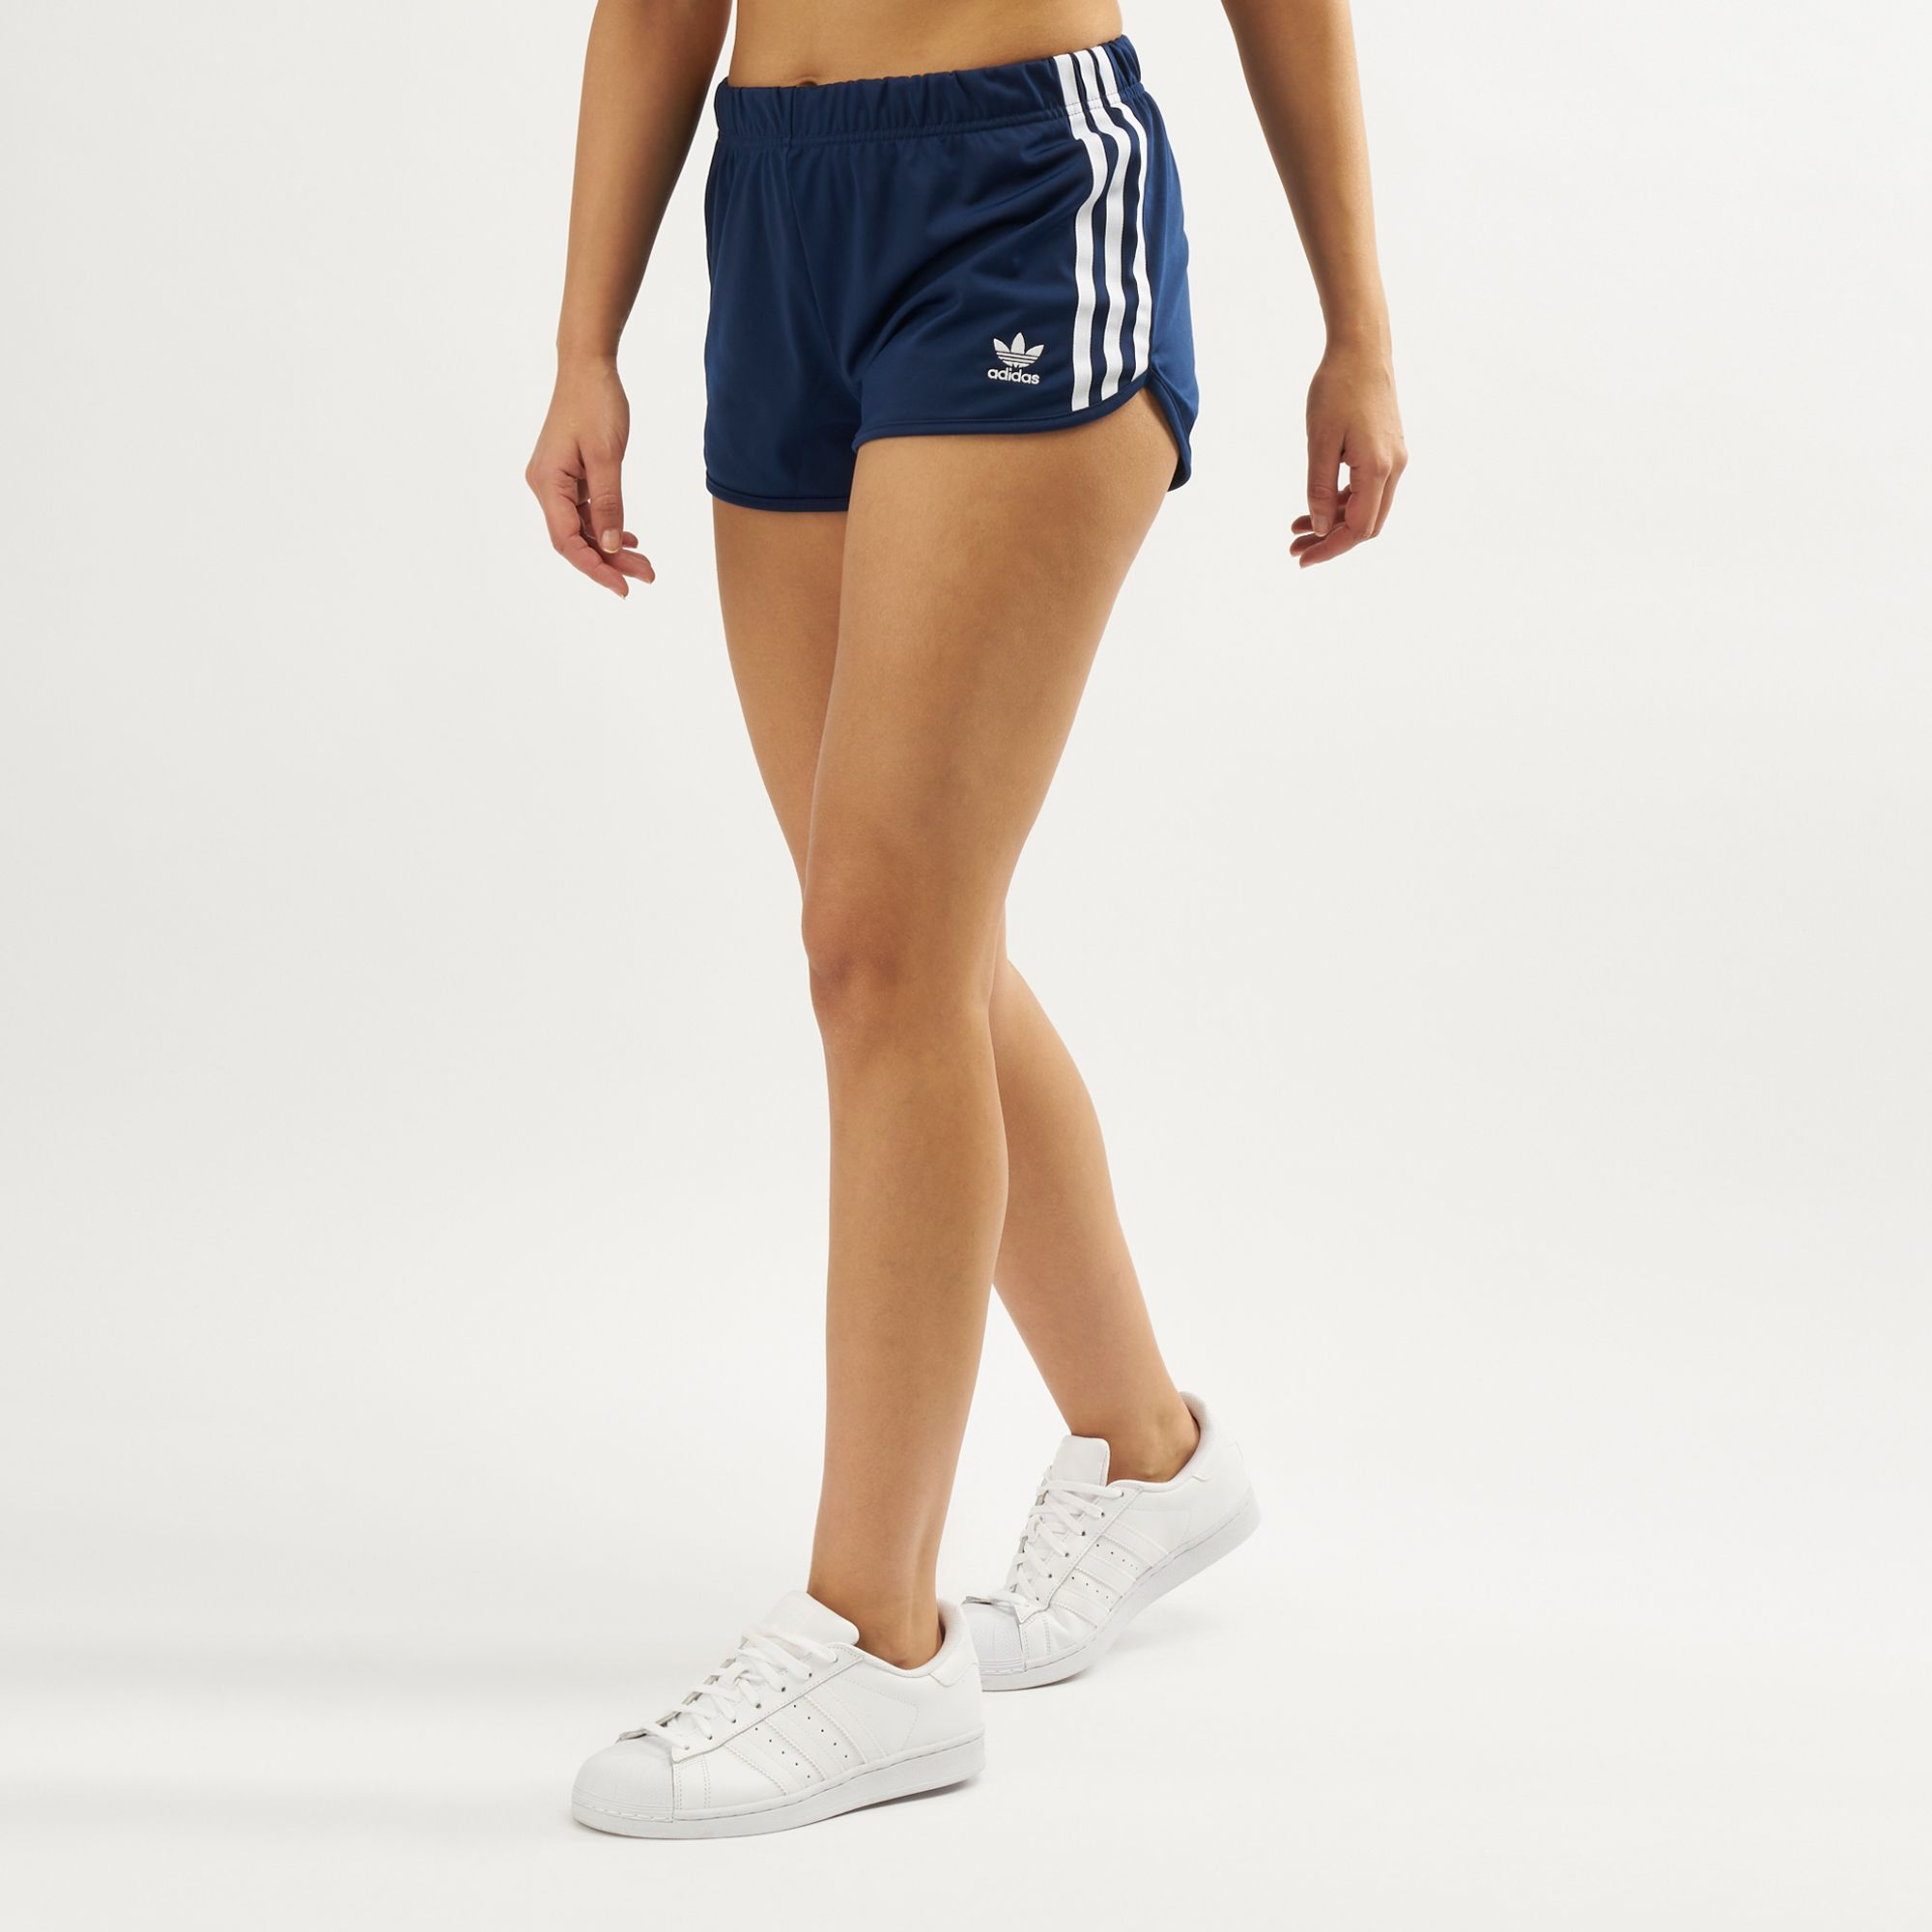 adidas Originals Women's 3 Stripes Shorts